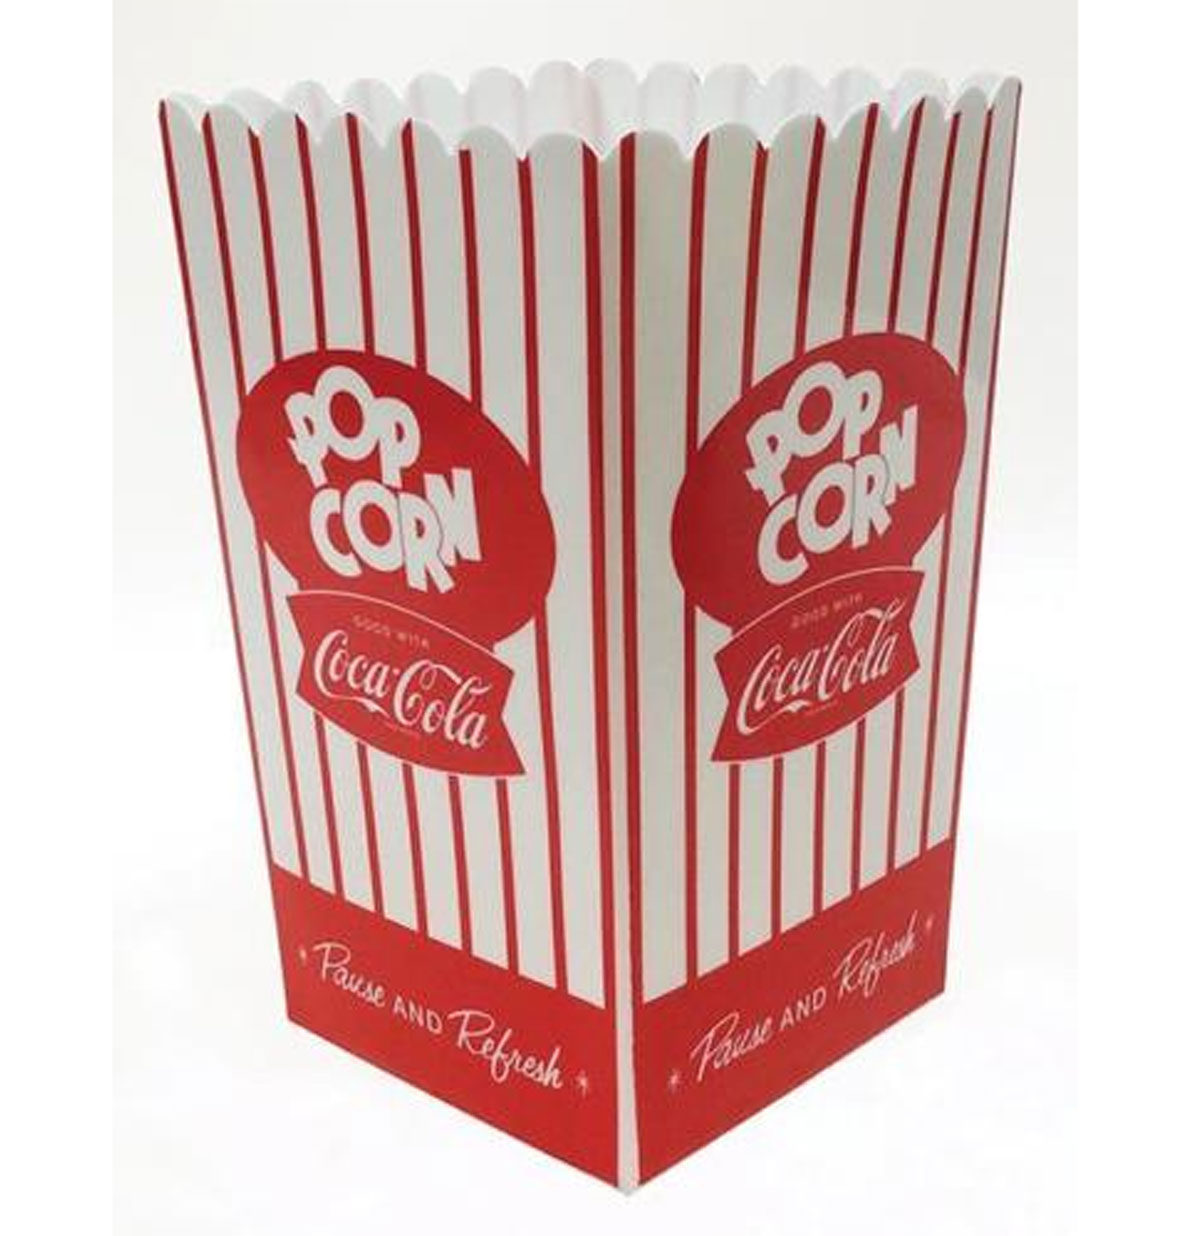 Coca-Cola Large Popcorn Bucket Plastic